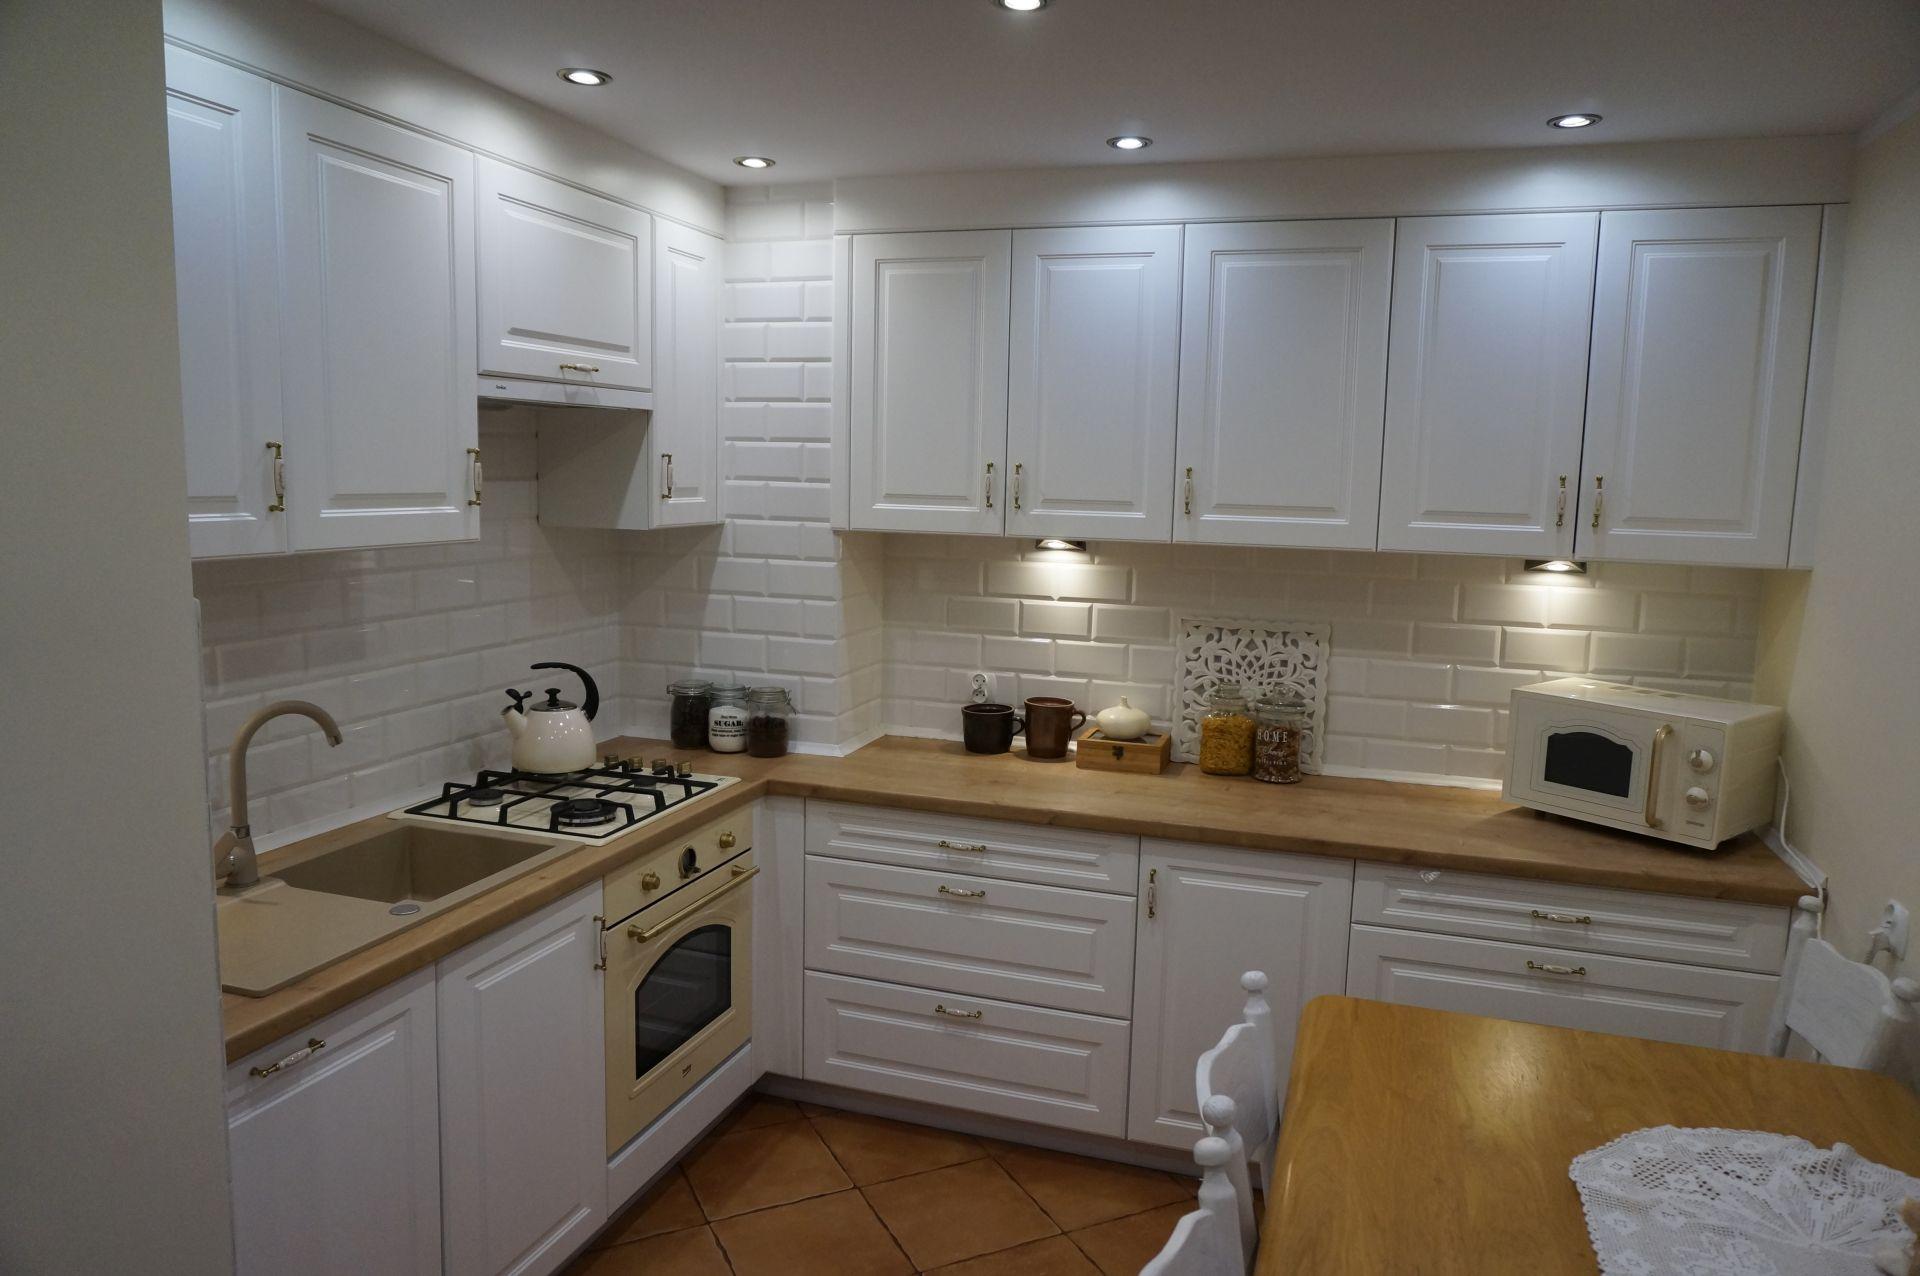 Skandynawskie Meble Kuchenne Na Wymiar Country Kitchen Home Kitchen